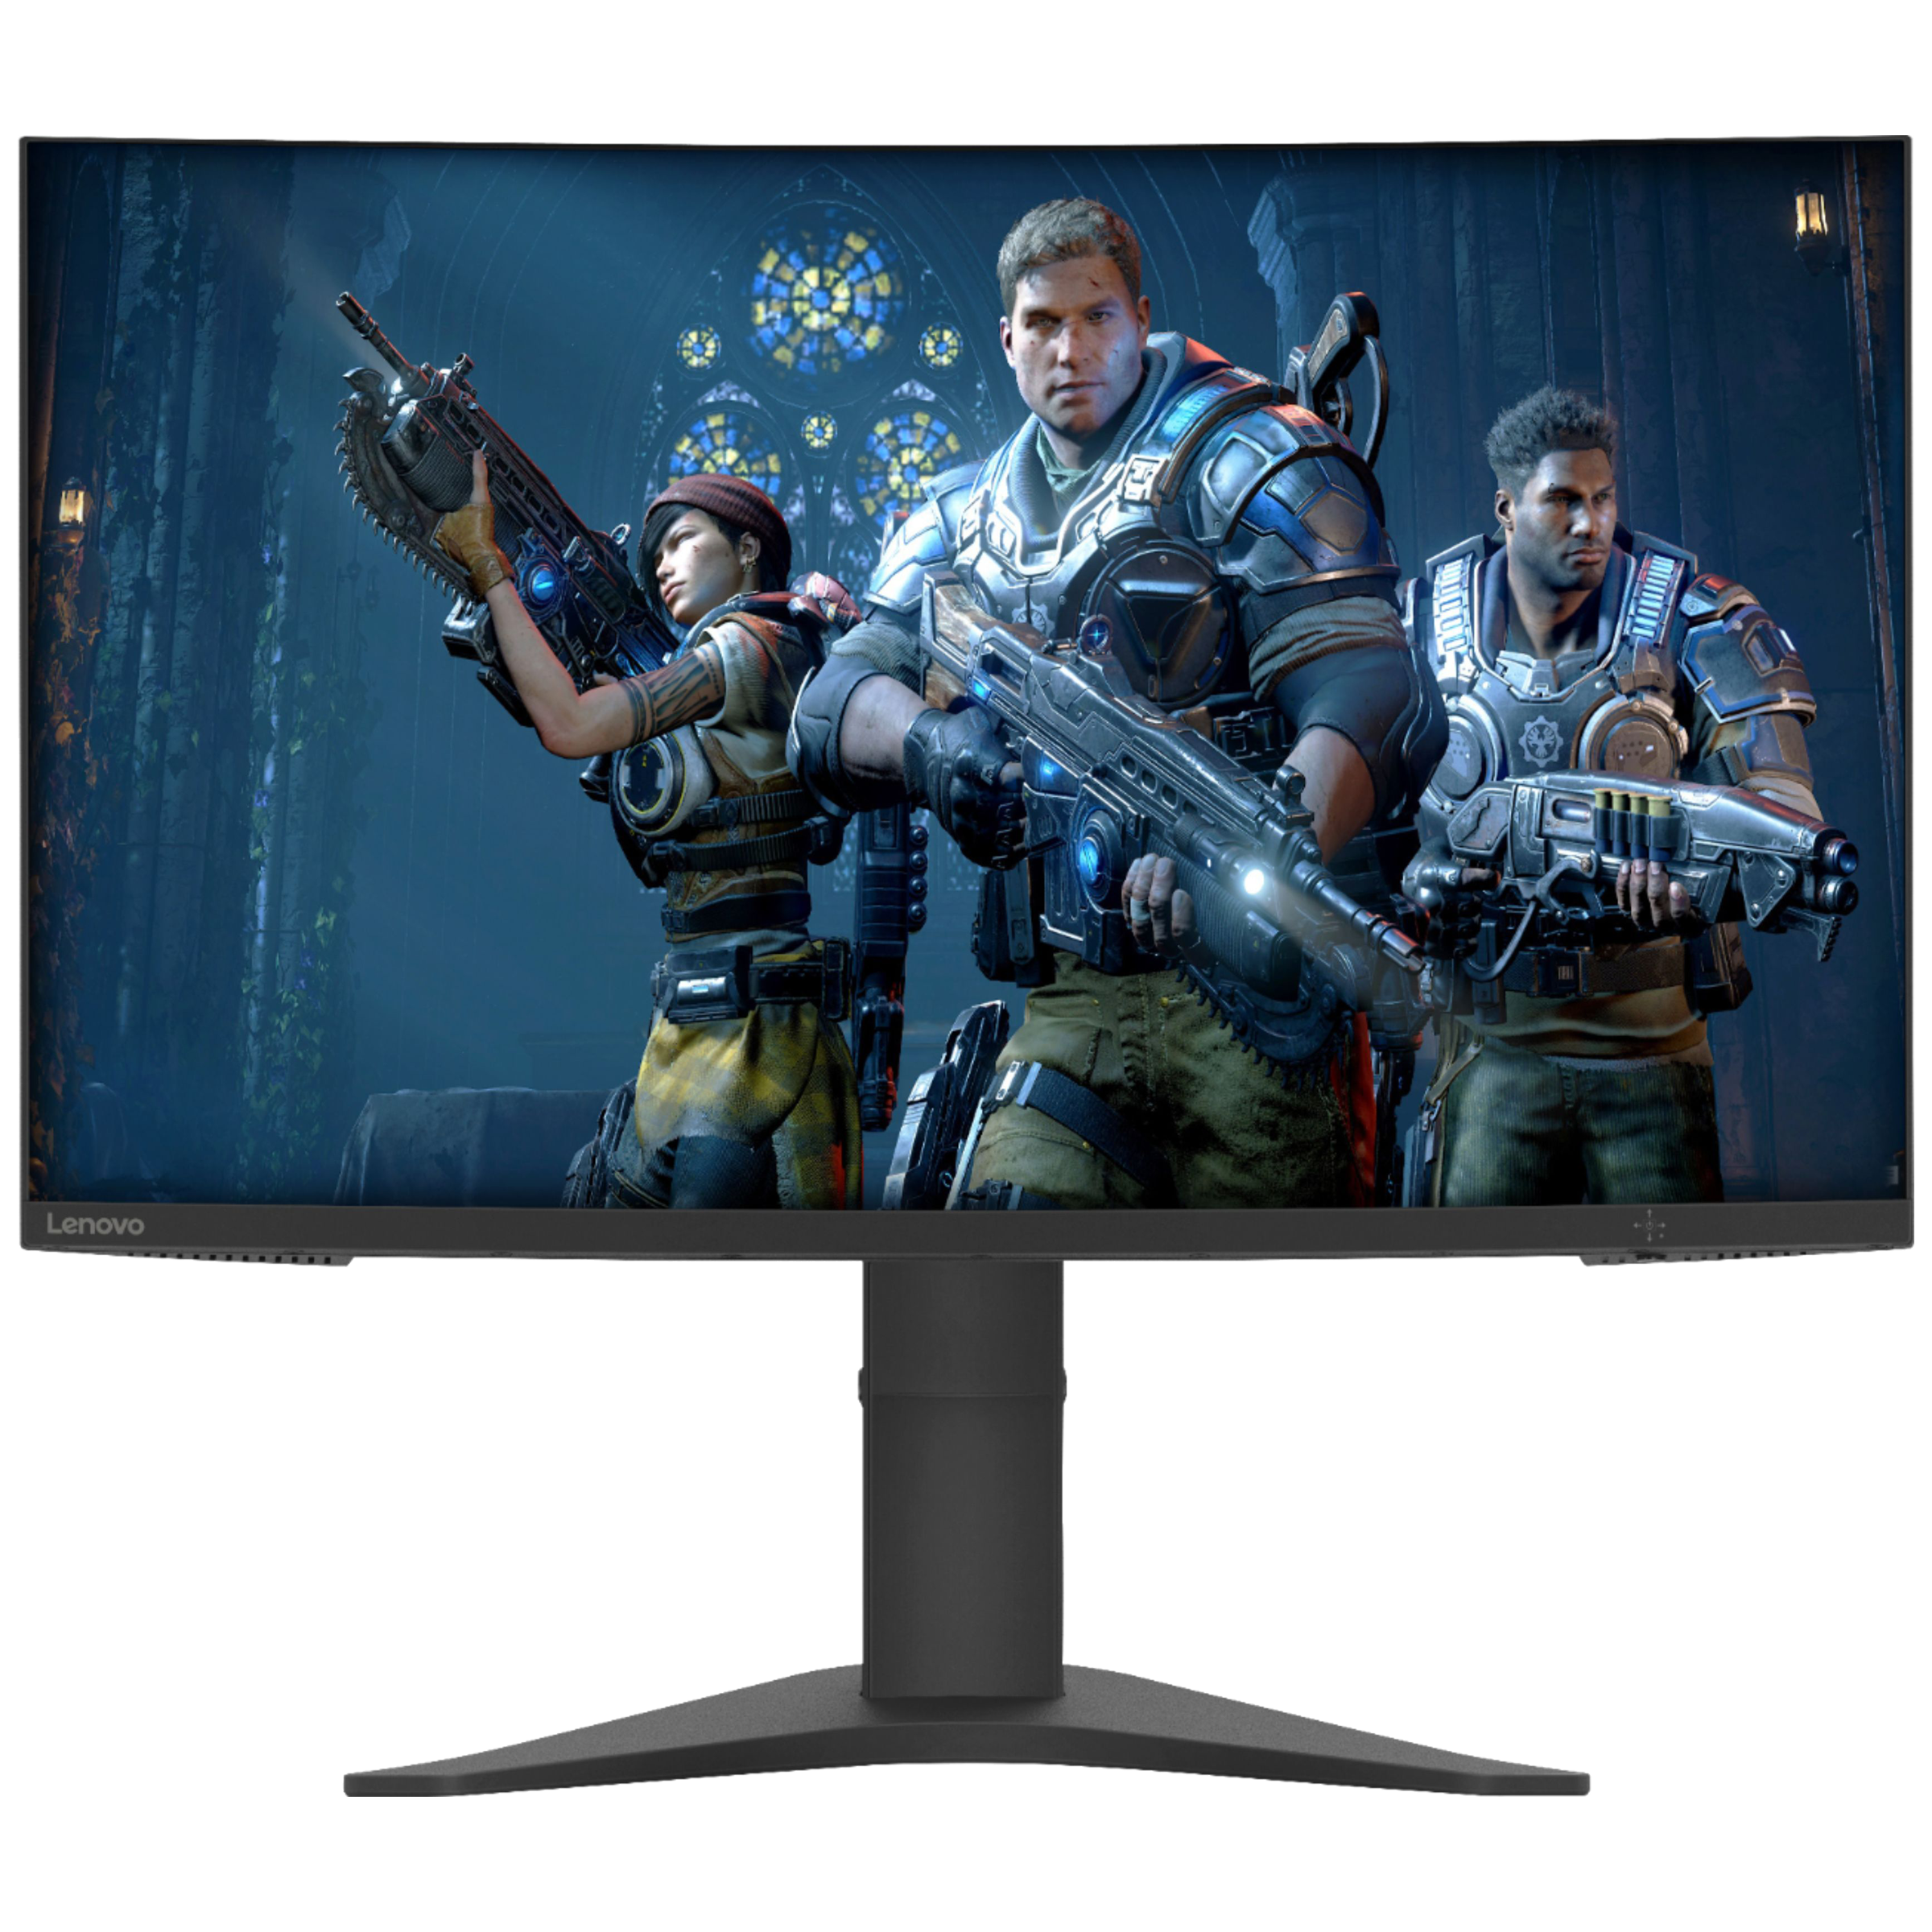 Lenovo G27c-10 68.58cm (27 Inches) Full HD LCD Gaming Monitor (AMD Radeon FreeSync Technology, HDMI + DisplayPort + Aux, 165 Hz, 66A3GACBIN, Black)_1